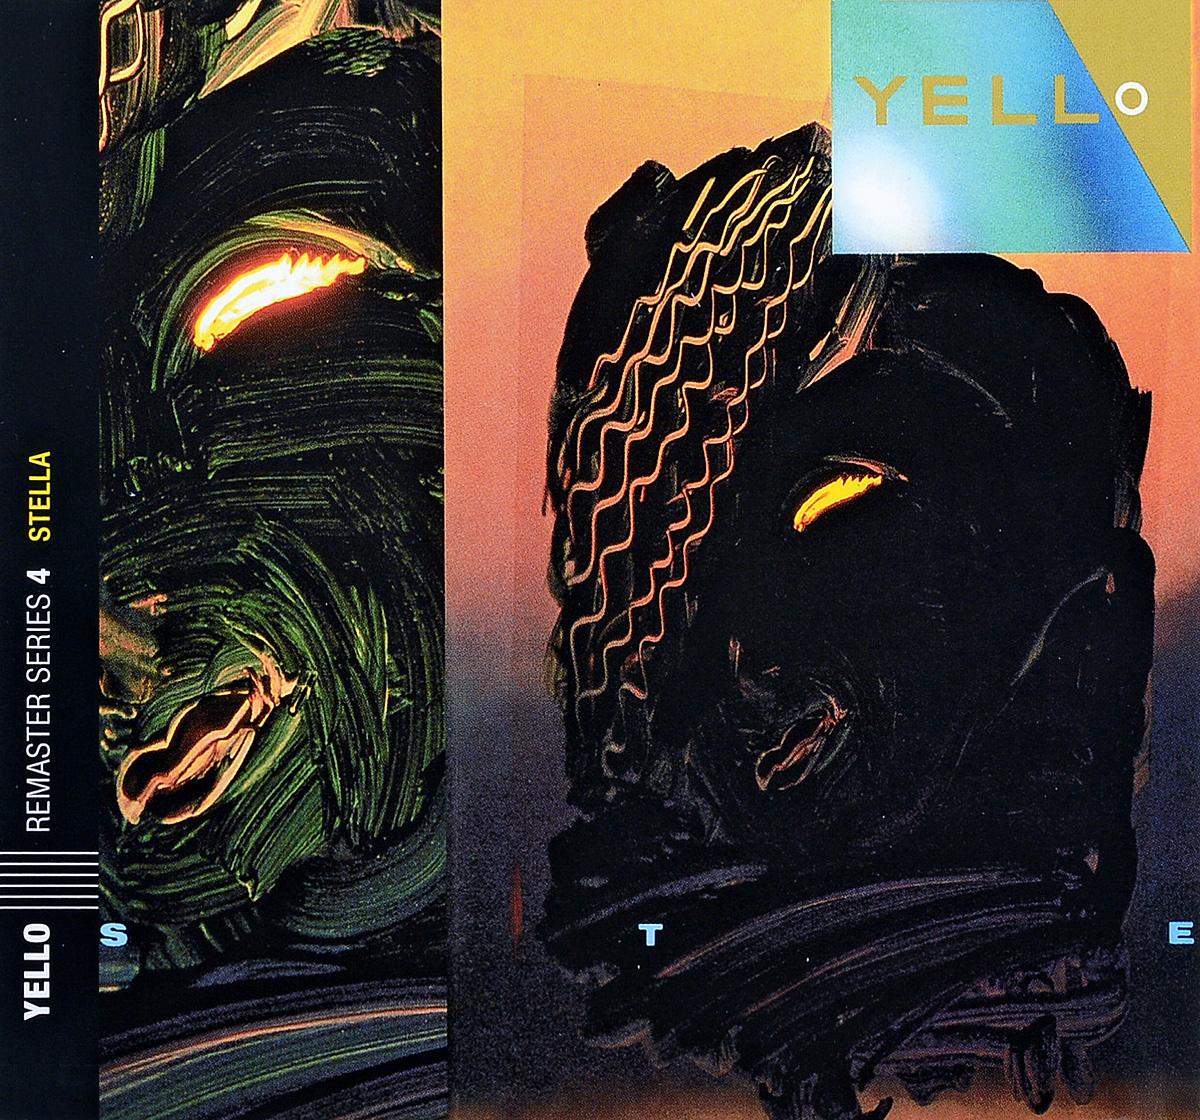 Yello Yello. Stella пазл 73 5 x 48 8 1000 элементов printio alleria windrunner world of warcraft